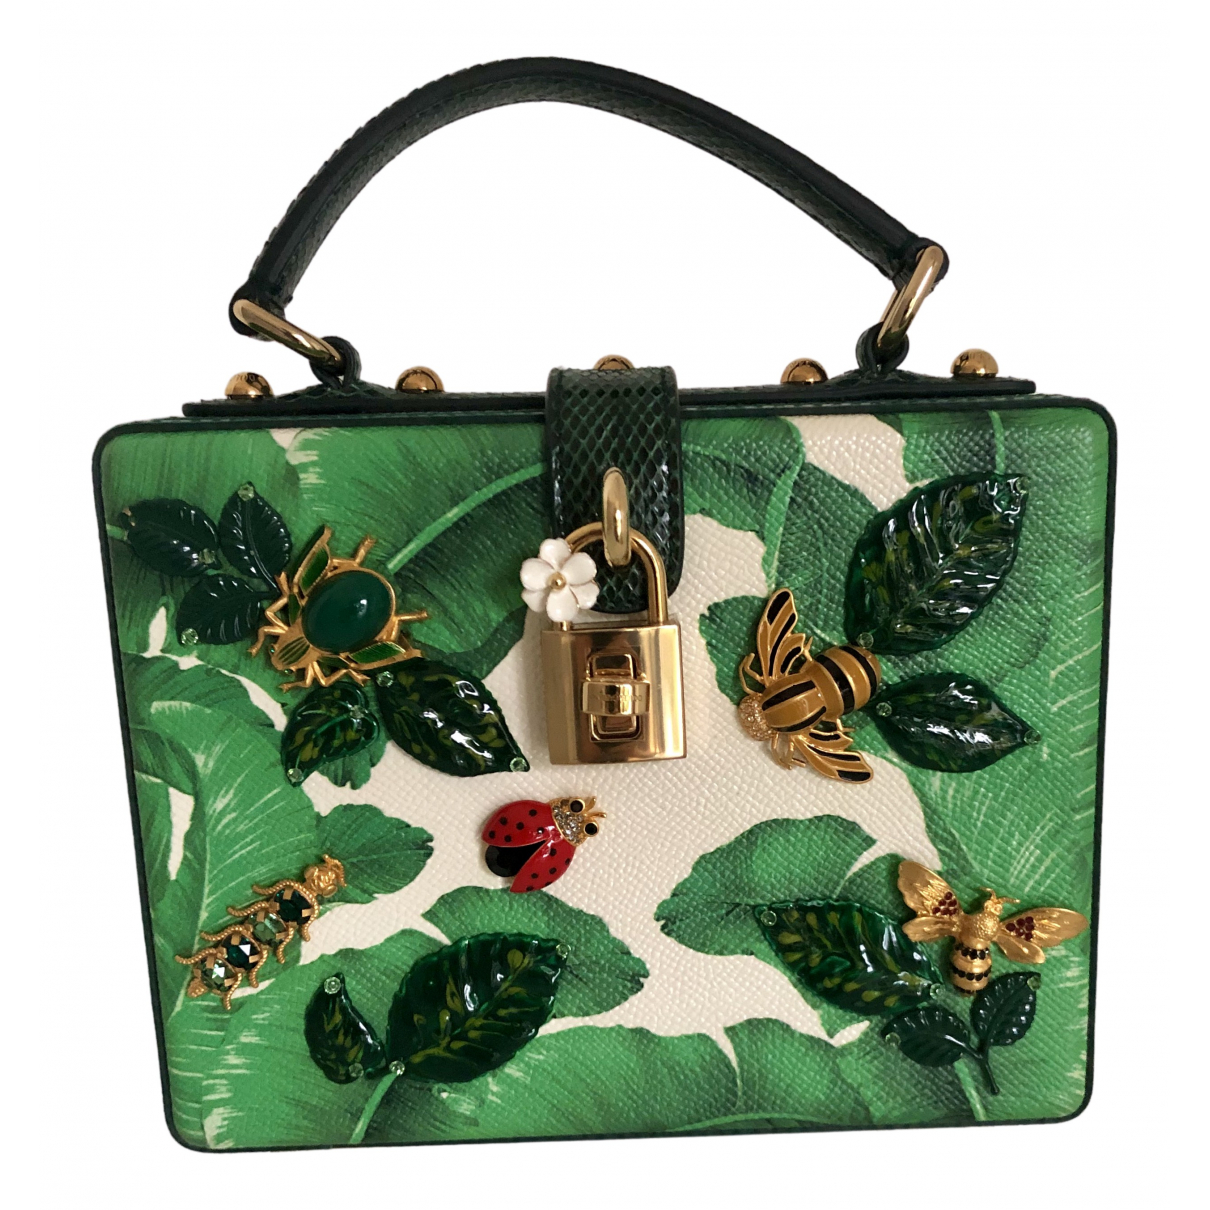 Dolce & Gabbana N Green Leather handbag for Women N